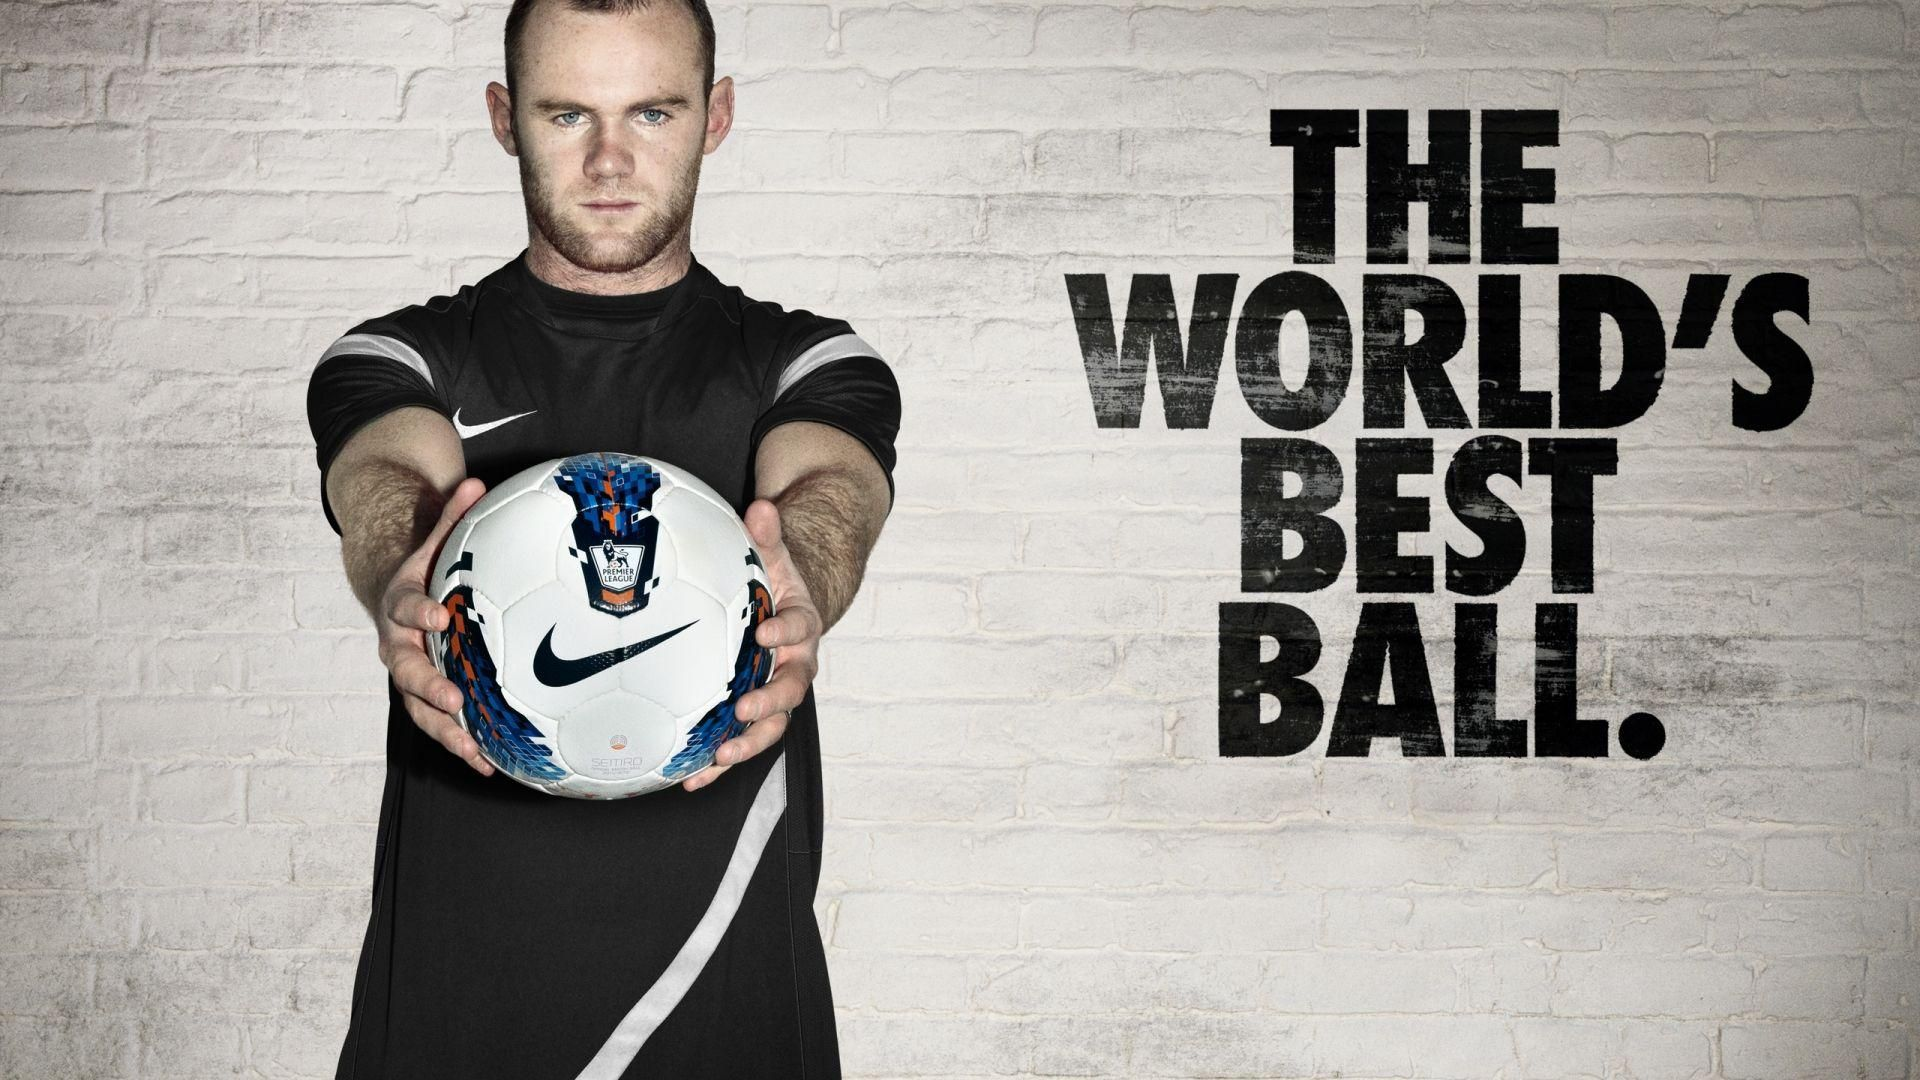 Wallpapers Nike Soccer - Wallpaper Cave